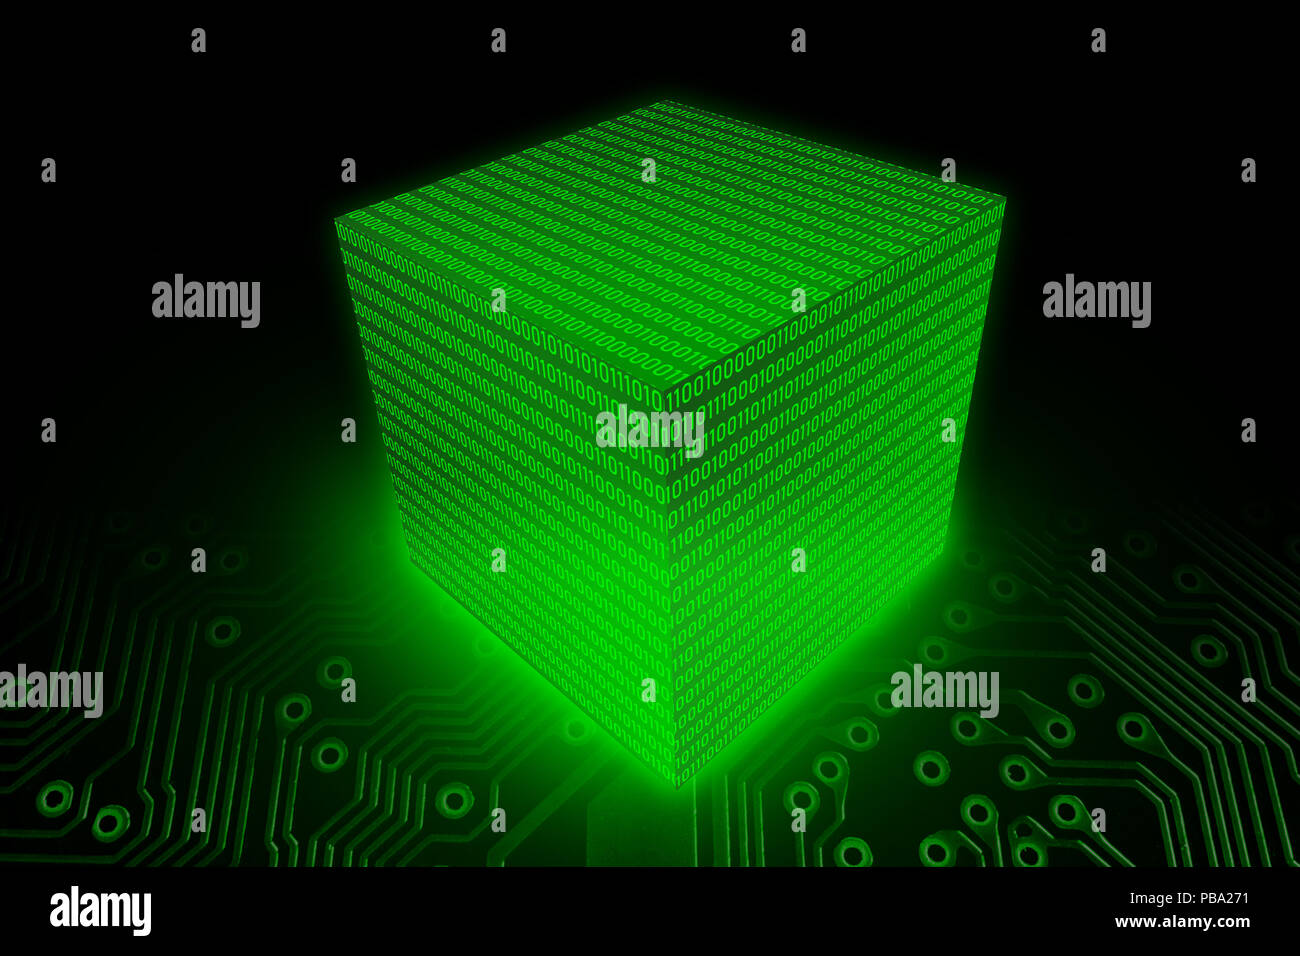 Data Block Cube of Binary digit (Bit) code, Digital computer data storage 3D illustration concept. - Stock Image